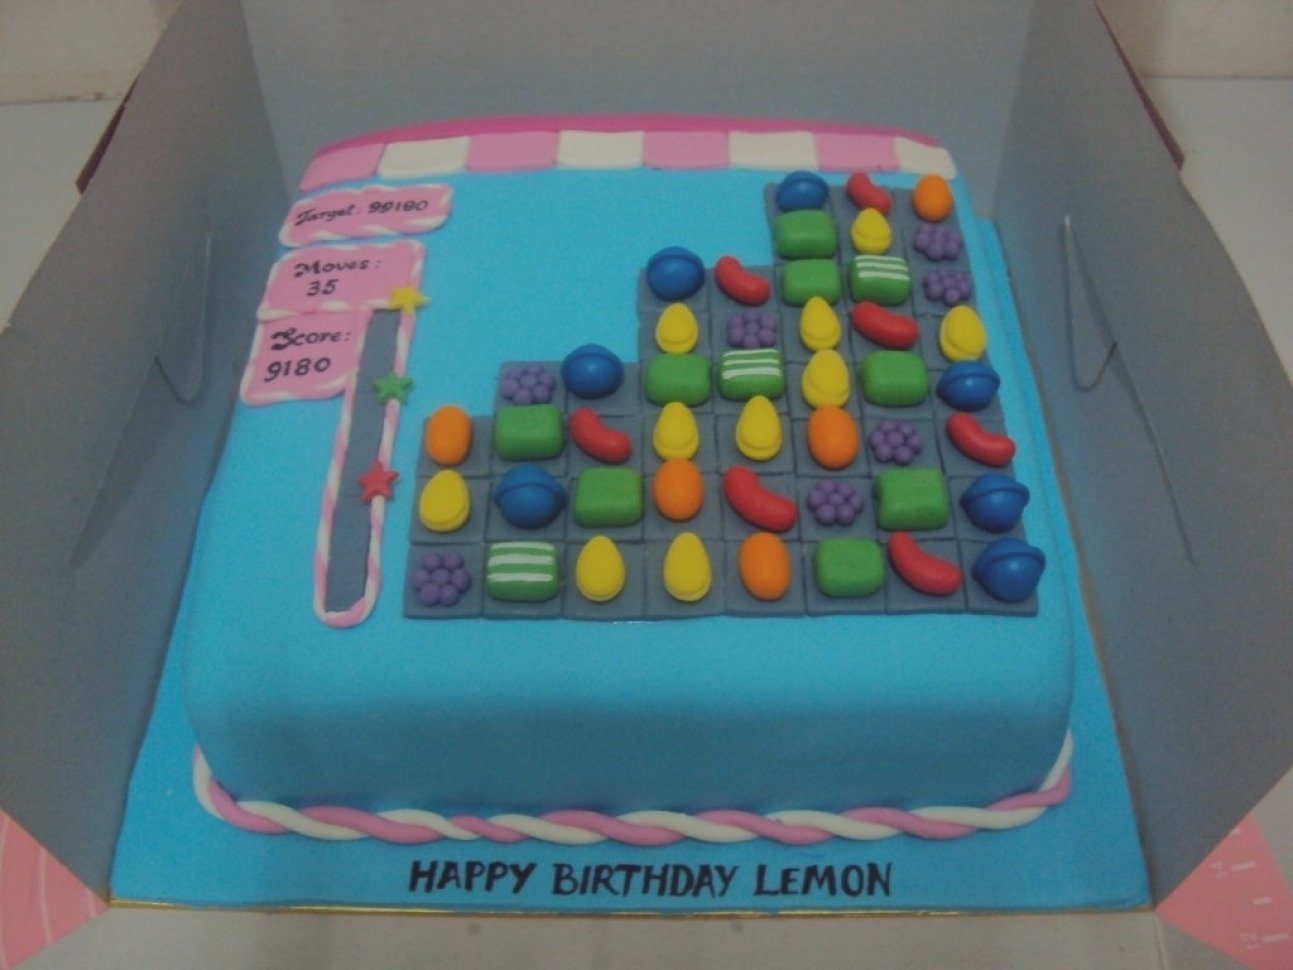 10 Stylish Easy Cake Decorating Ideas For Beginners gallery of cake decorating ideas for beginners birthday simple 1 2020